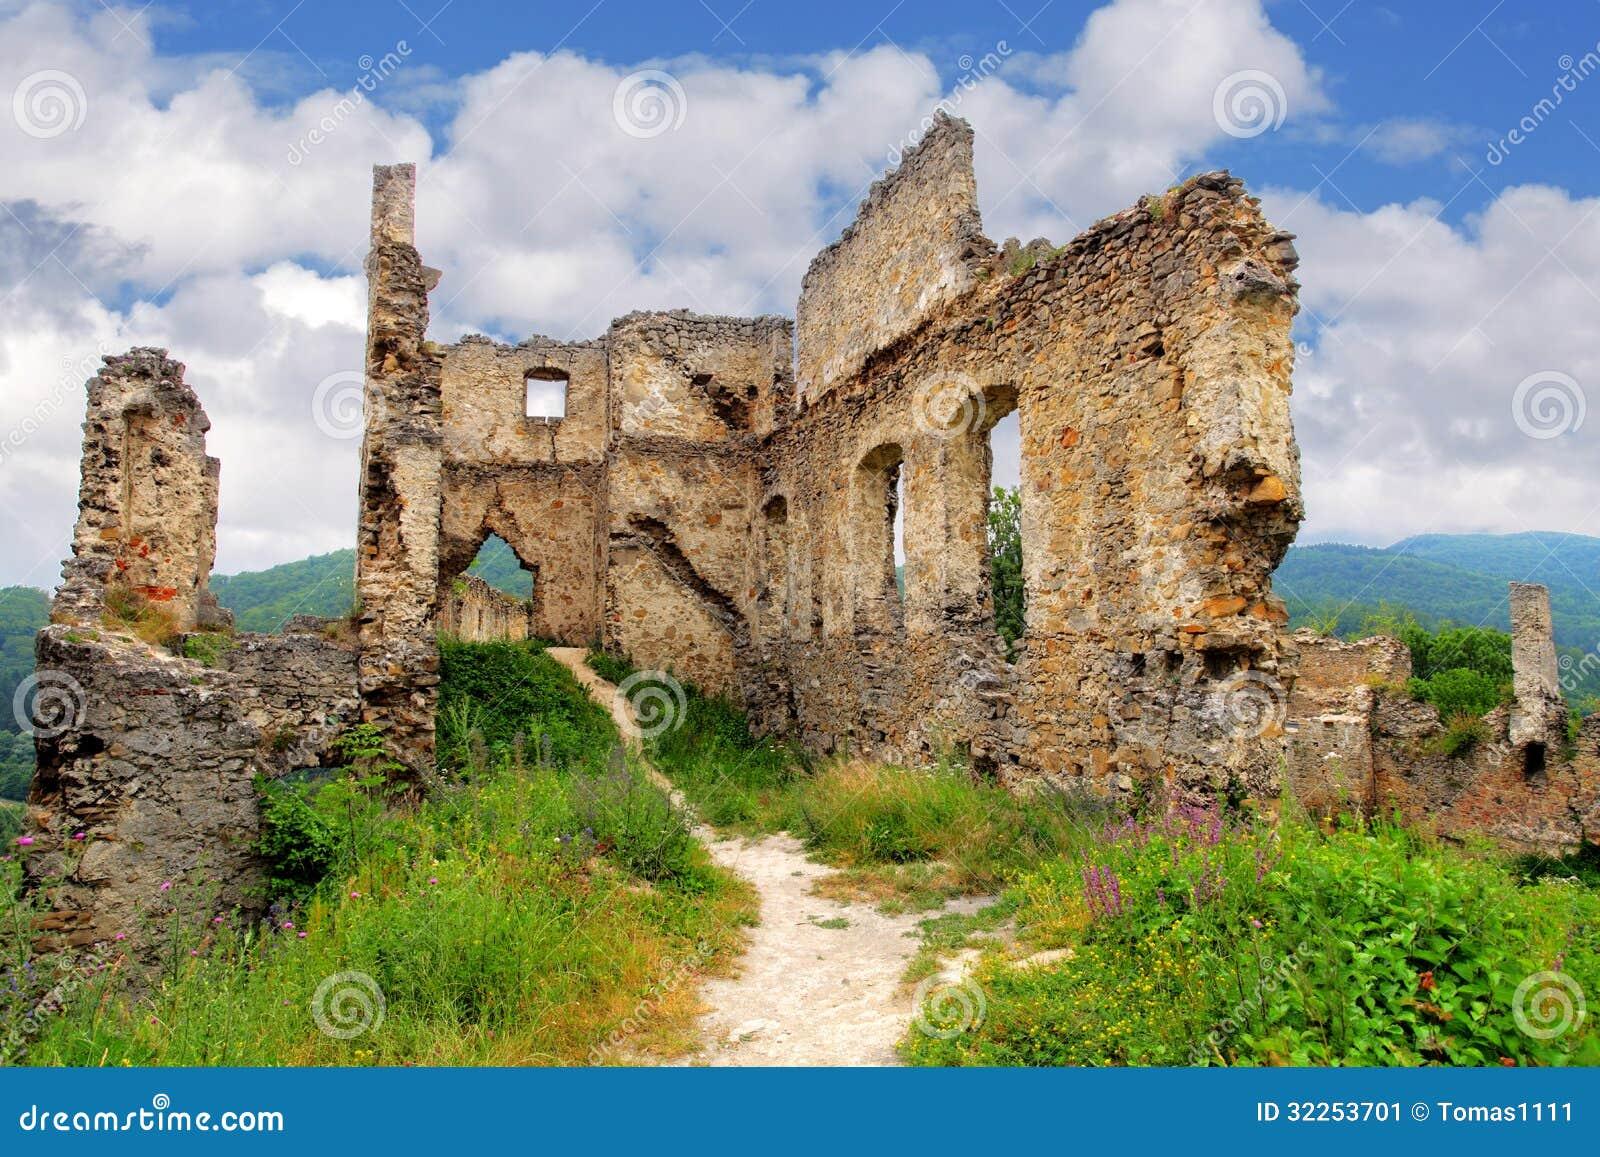 Ruïne van kasteel - Povazsky hrad, Slowakije